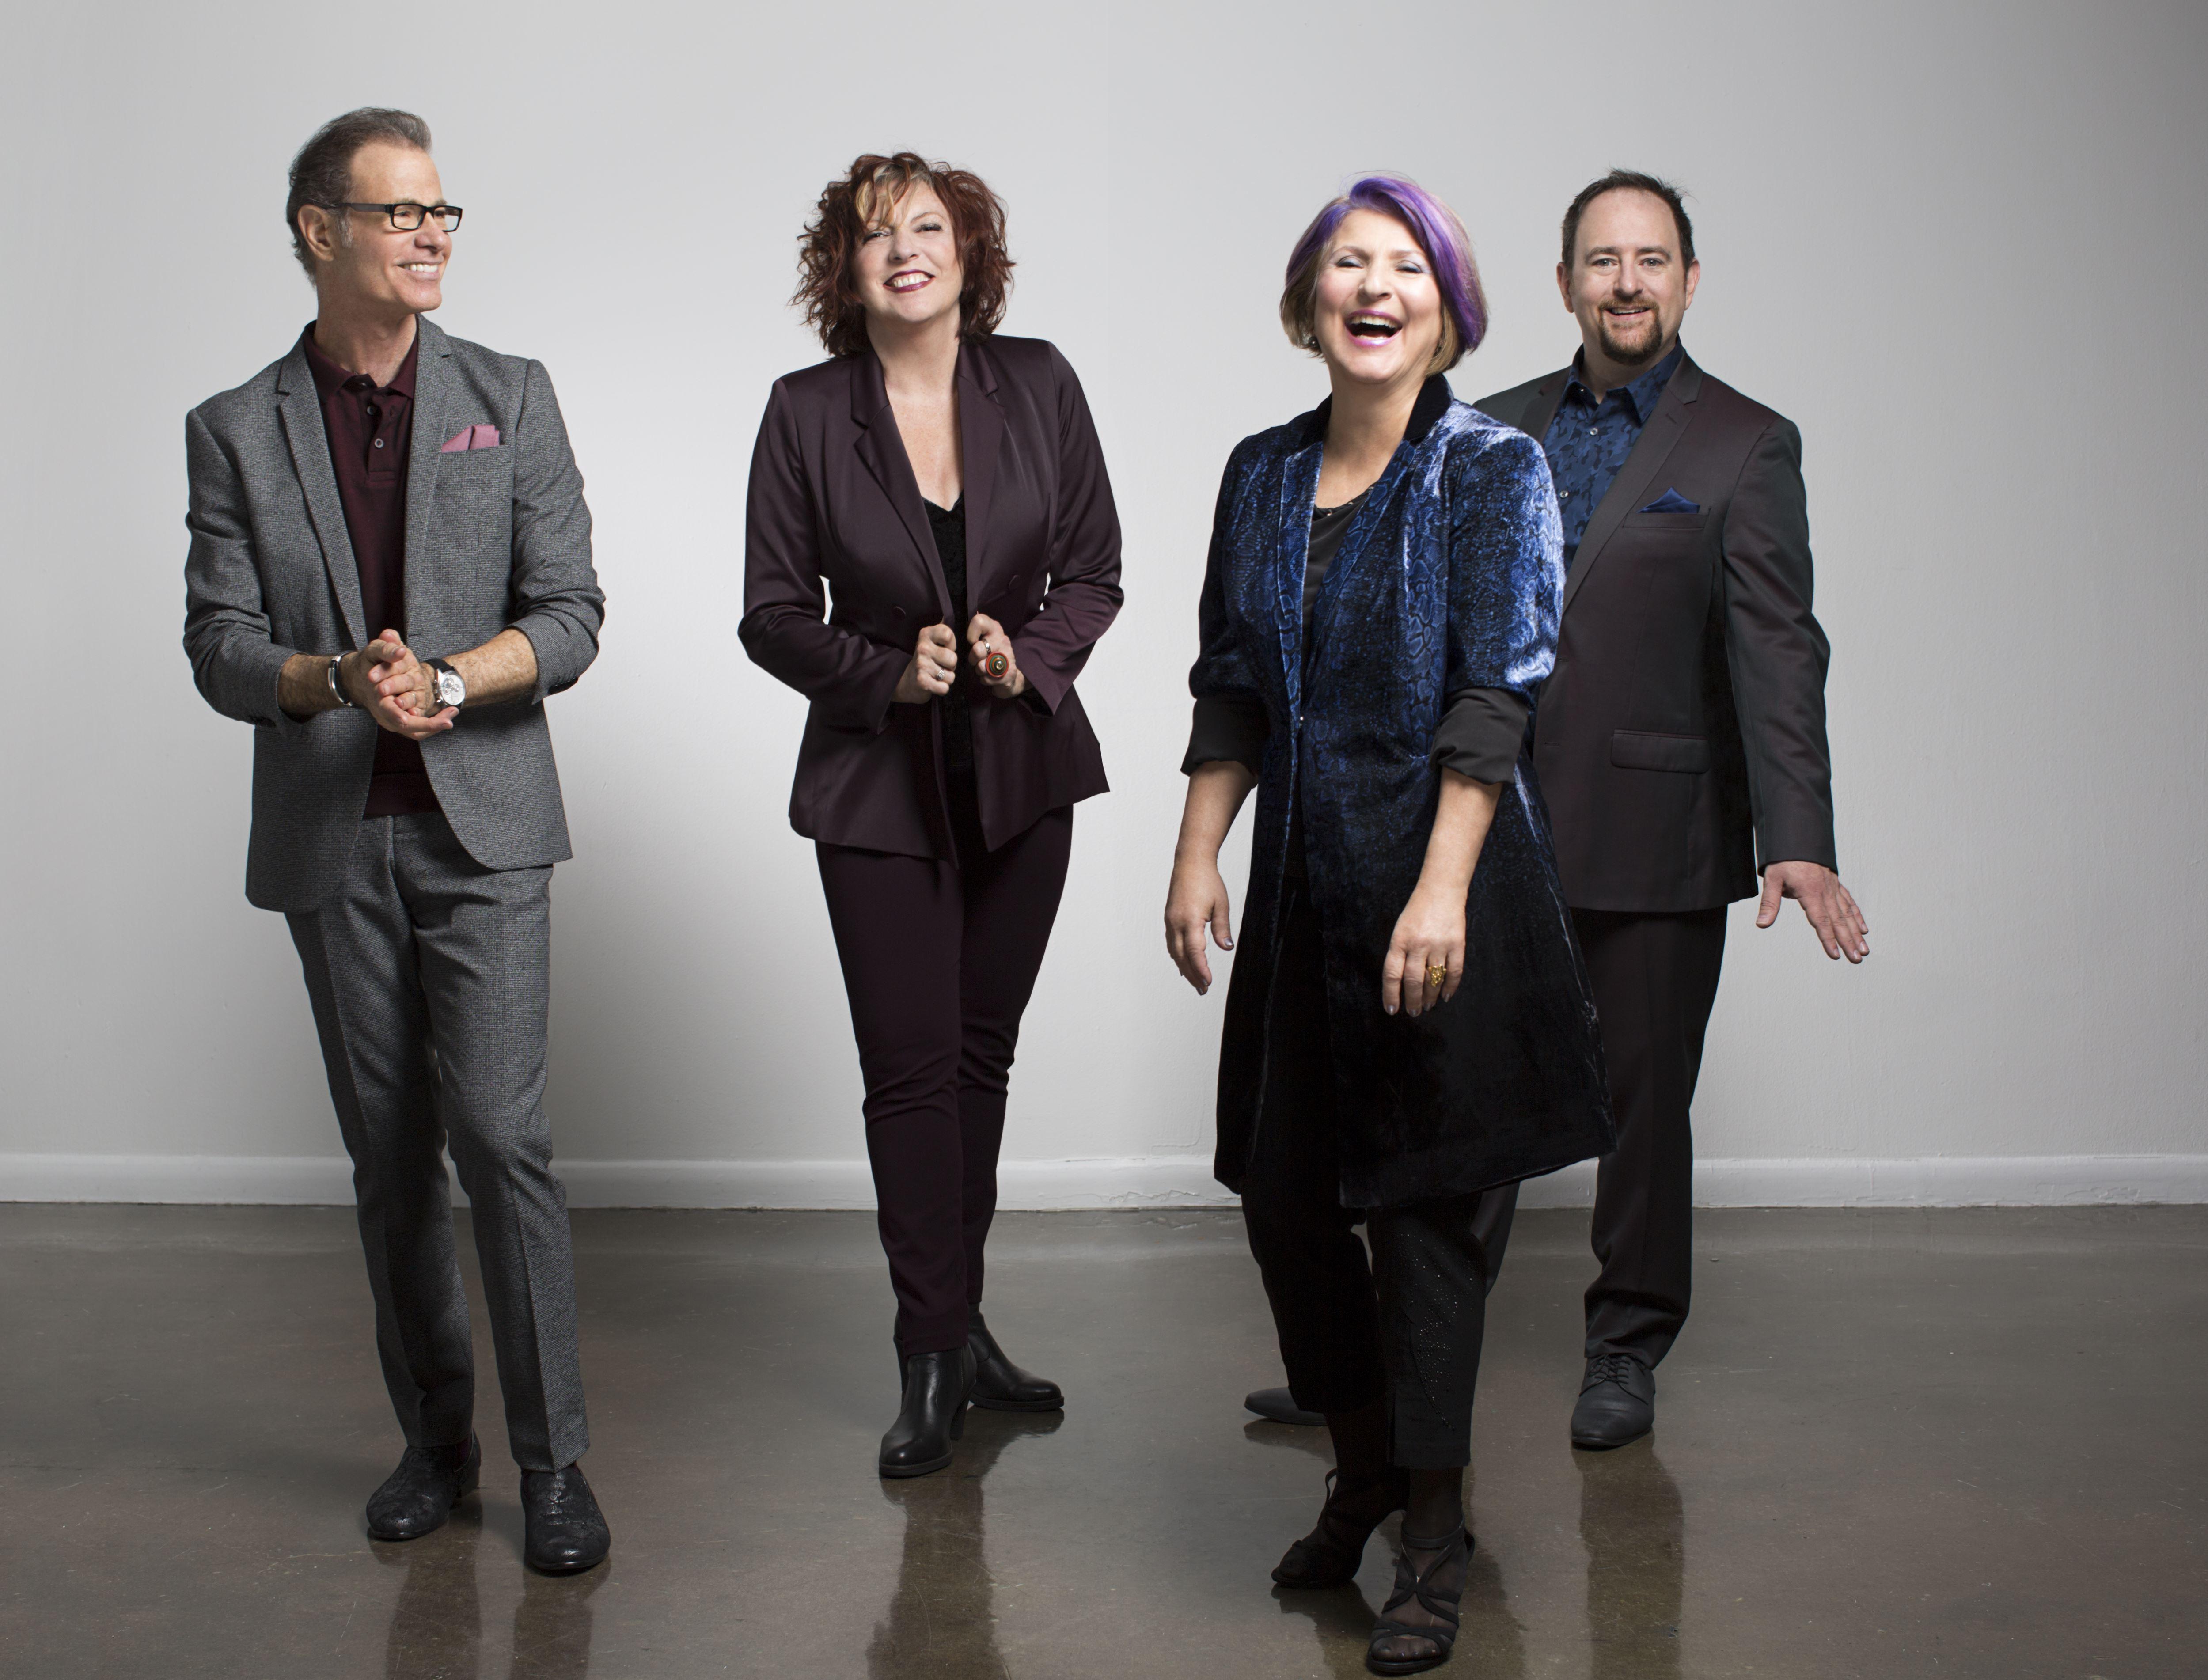 Alan Paul, Cheryl Bentyne, Janis Siegel and Trist Curless (from left) are the Manhattan Transfer (photo by John Abbott)